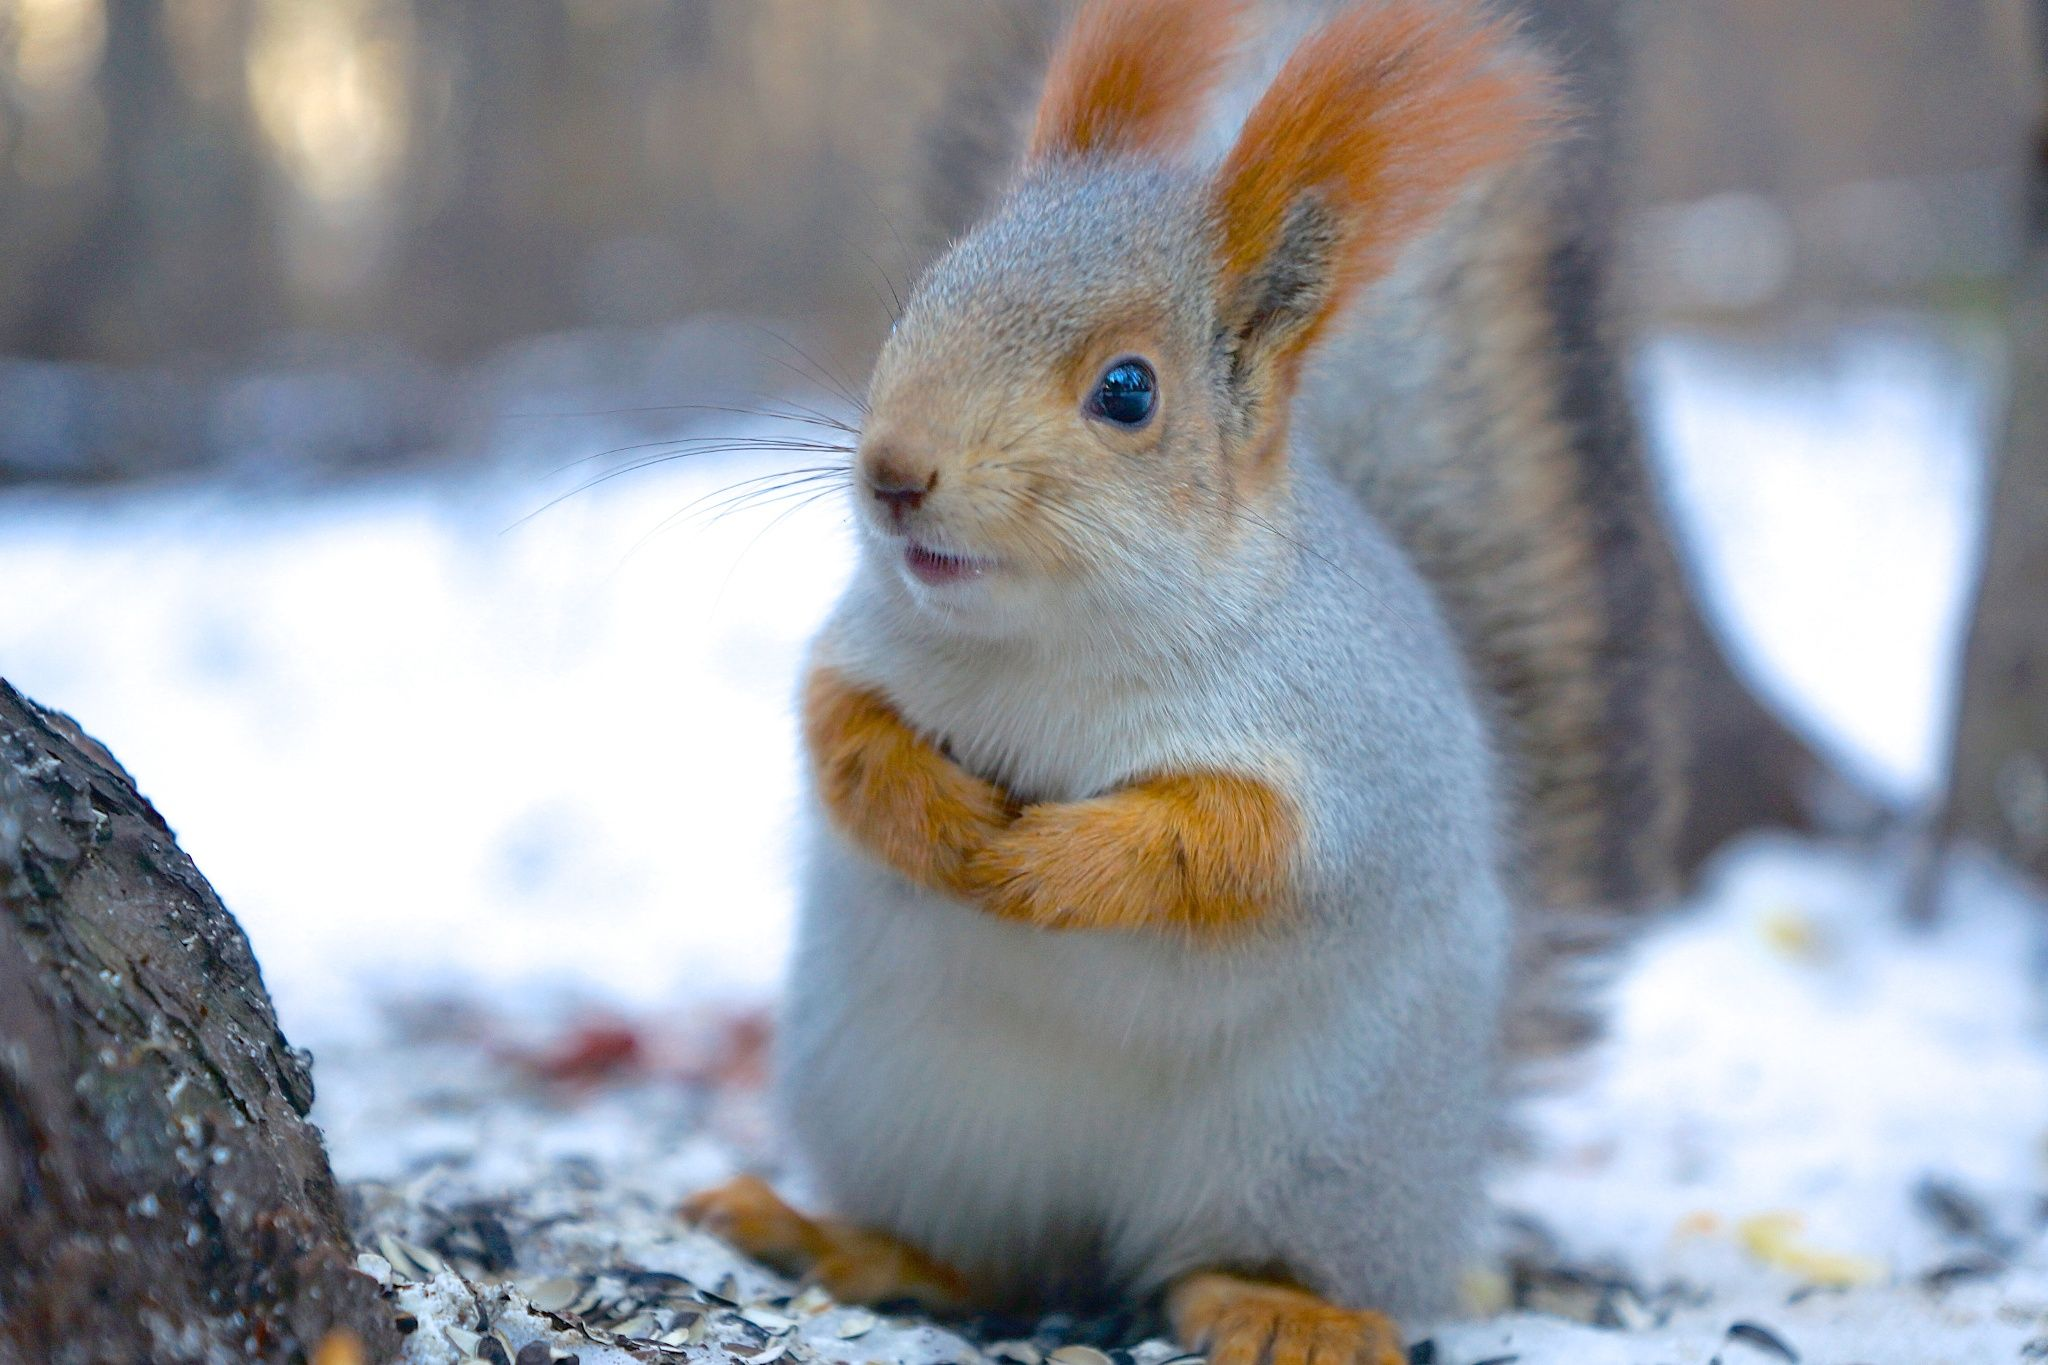 Photograph Squirrel by Anastasia Dolzhikova on 500px